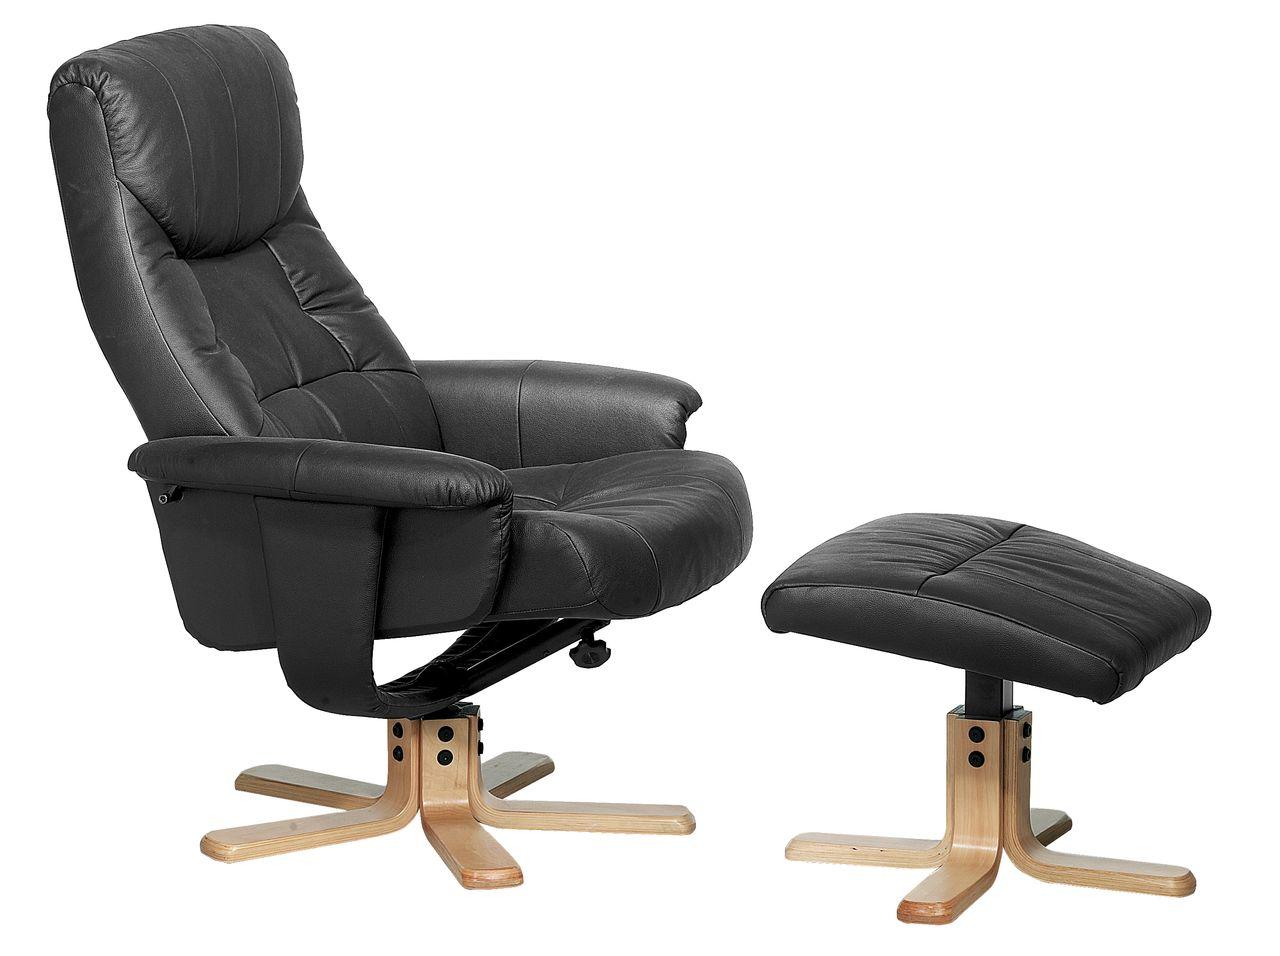 Armchair With Footstool HUNDSLUND Black JYSK